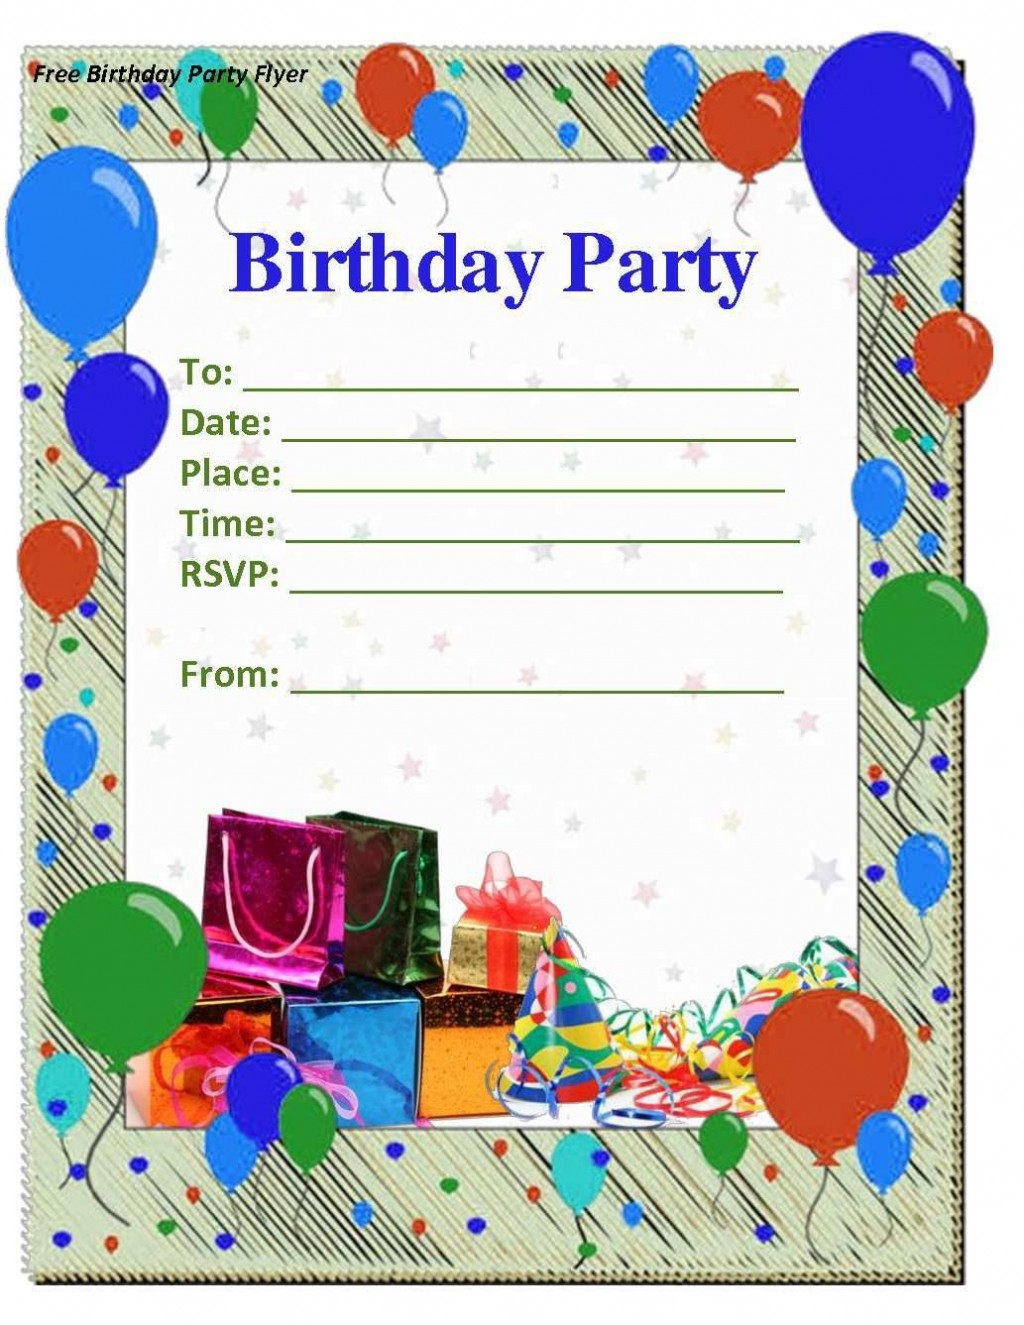 003 Formidable Birthday Invitation Card Word Format Photo  Template FreeLarge